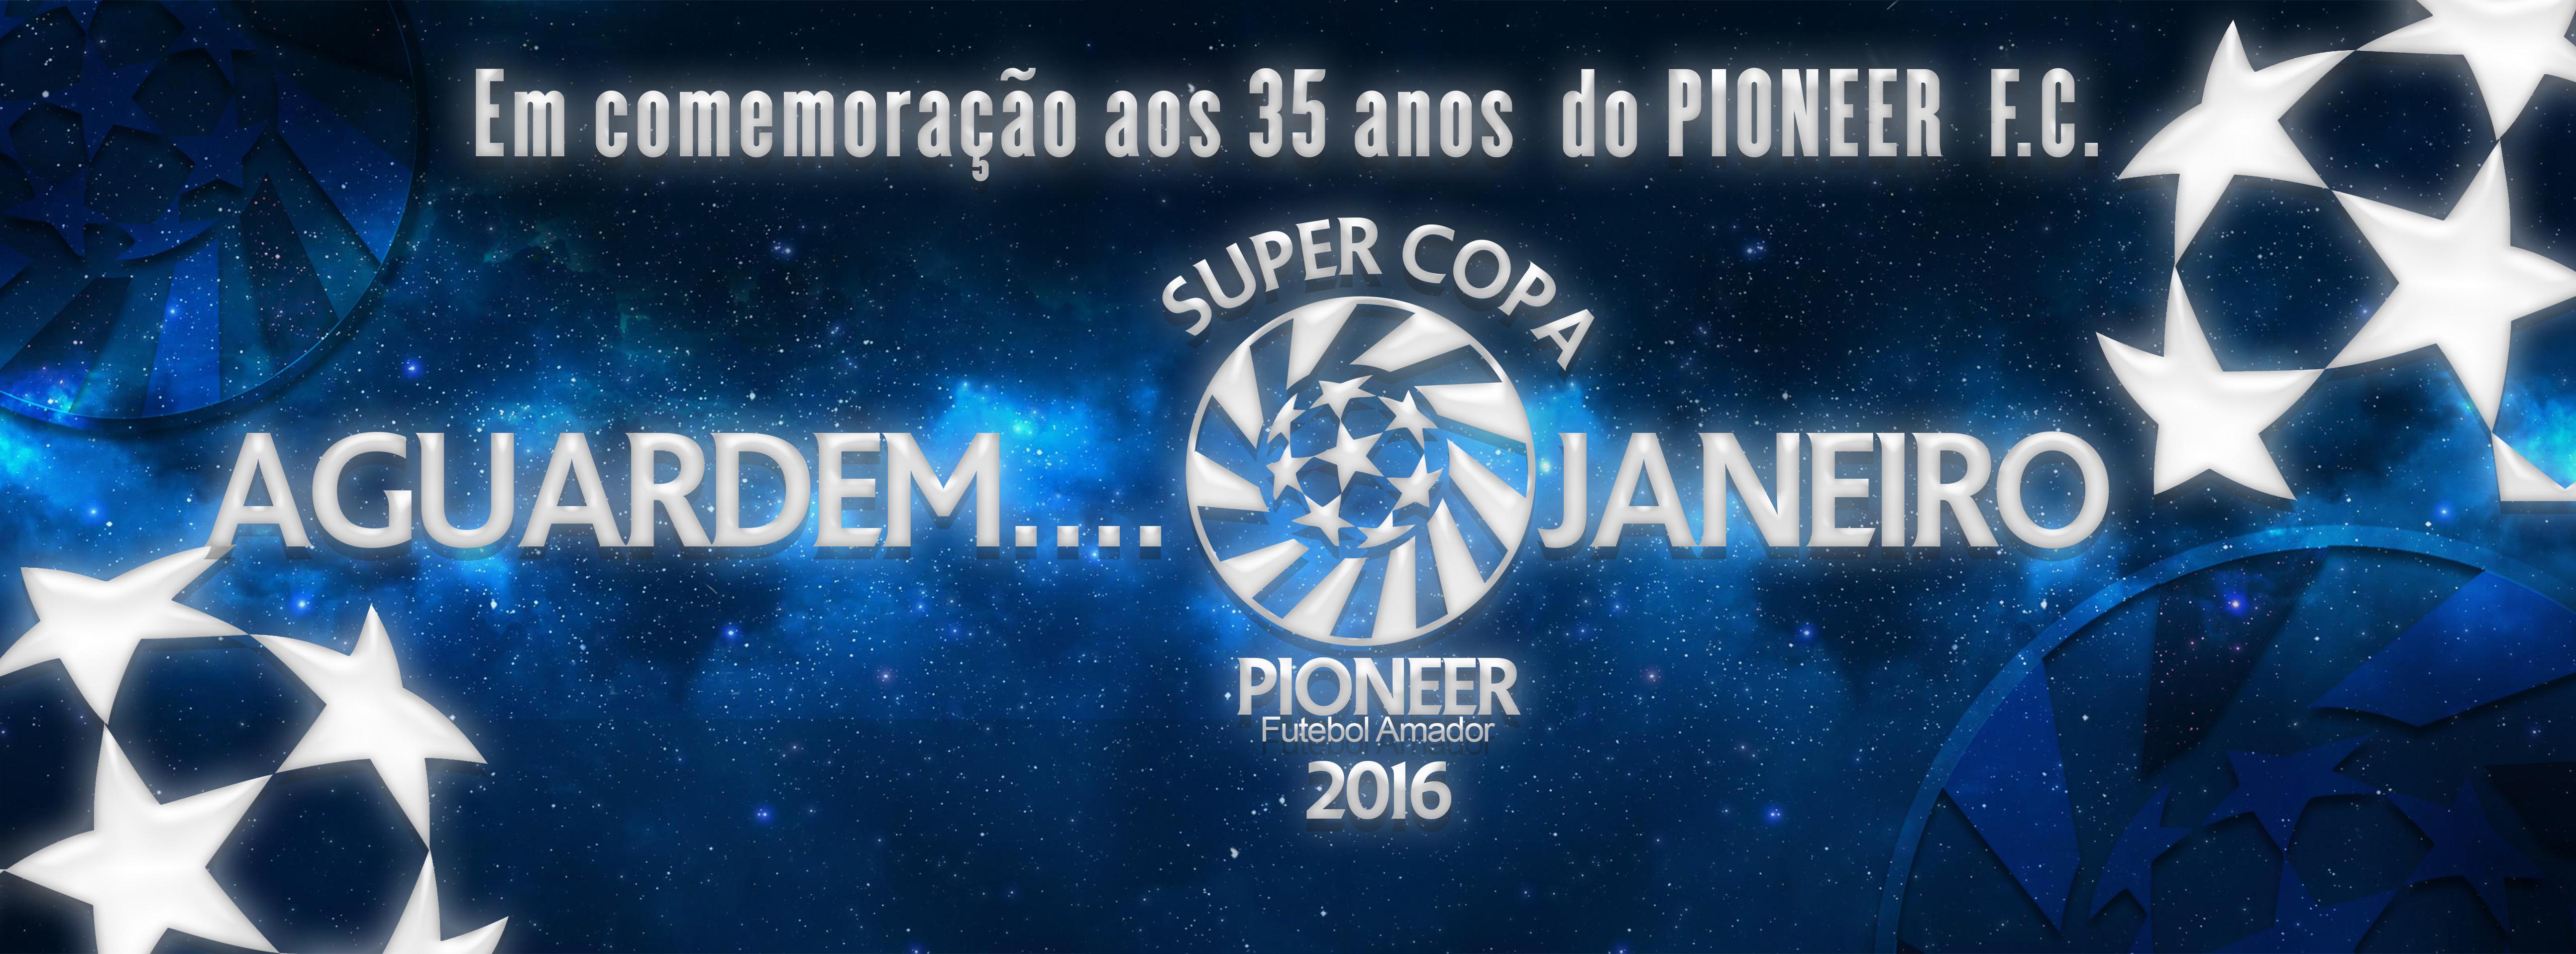 Super Copa Pioneer vai agitar São Paulo em 2016